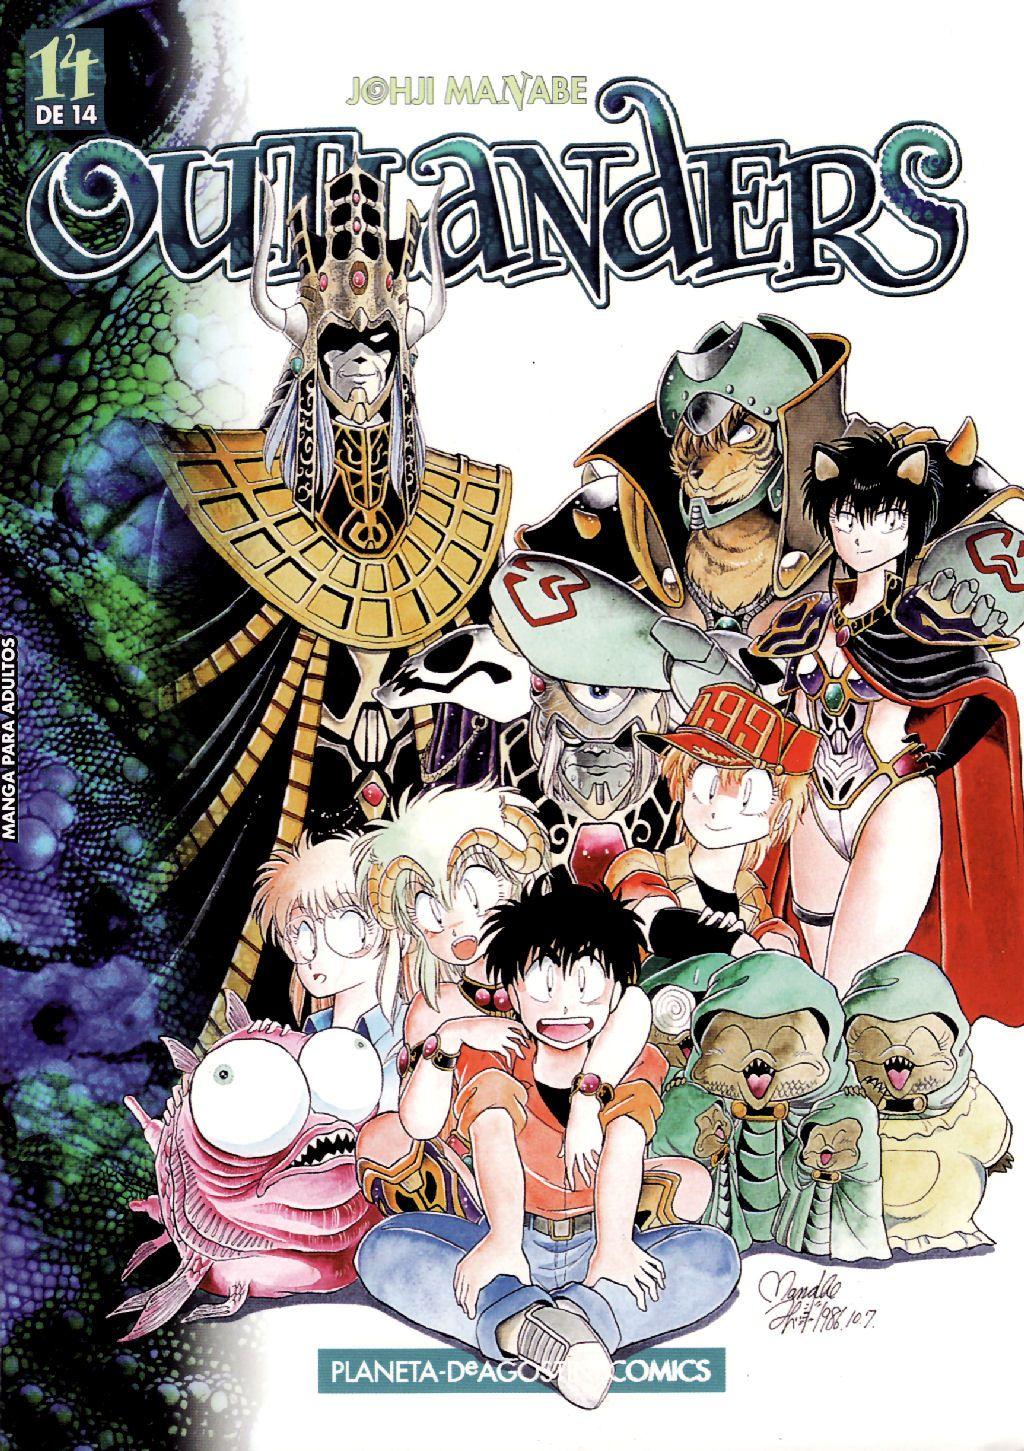 https://c5.mangatag.com/es_manga/49/20145/482439/2f60d946251d2dfd719925f3fa1fed01.jpg Page 1